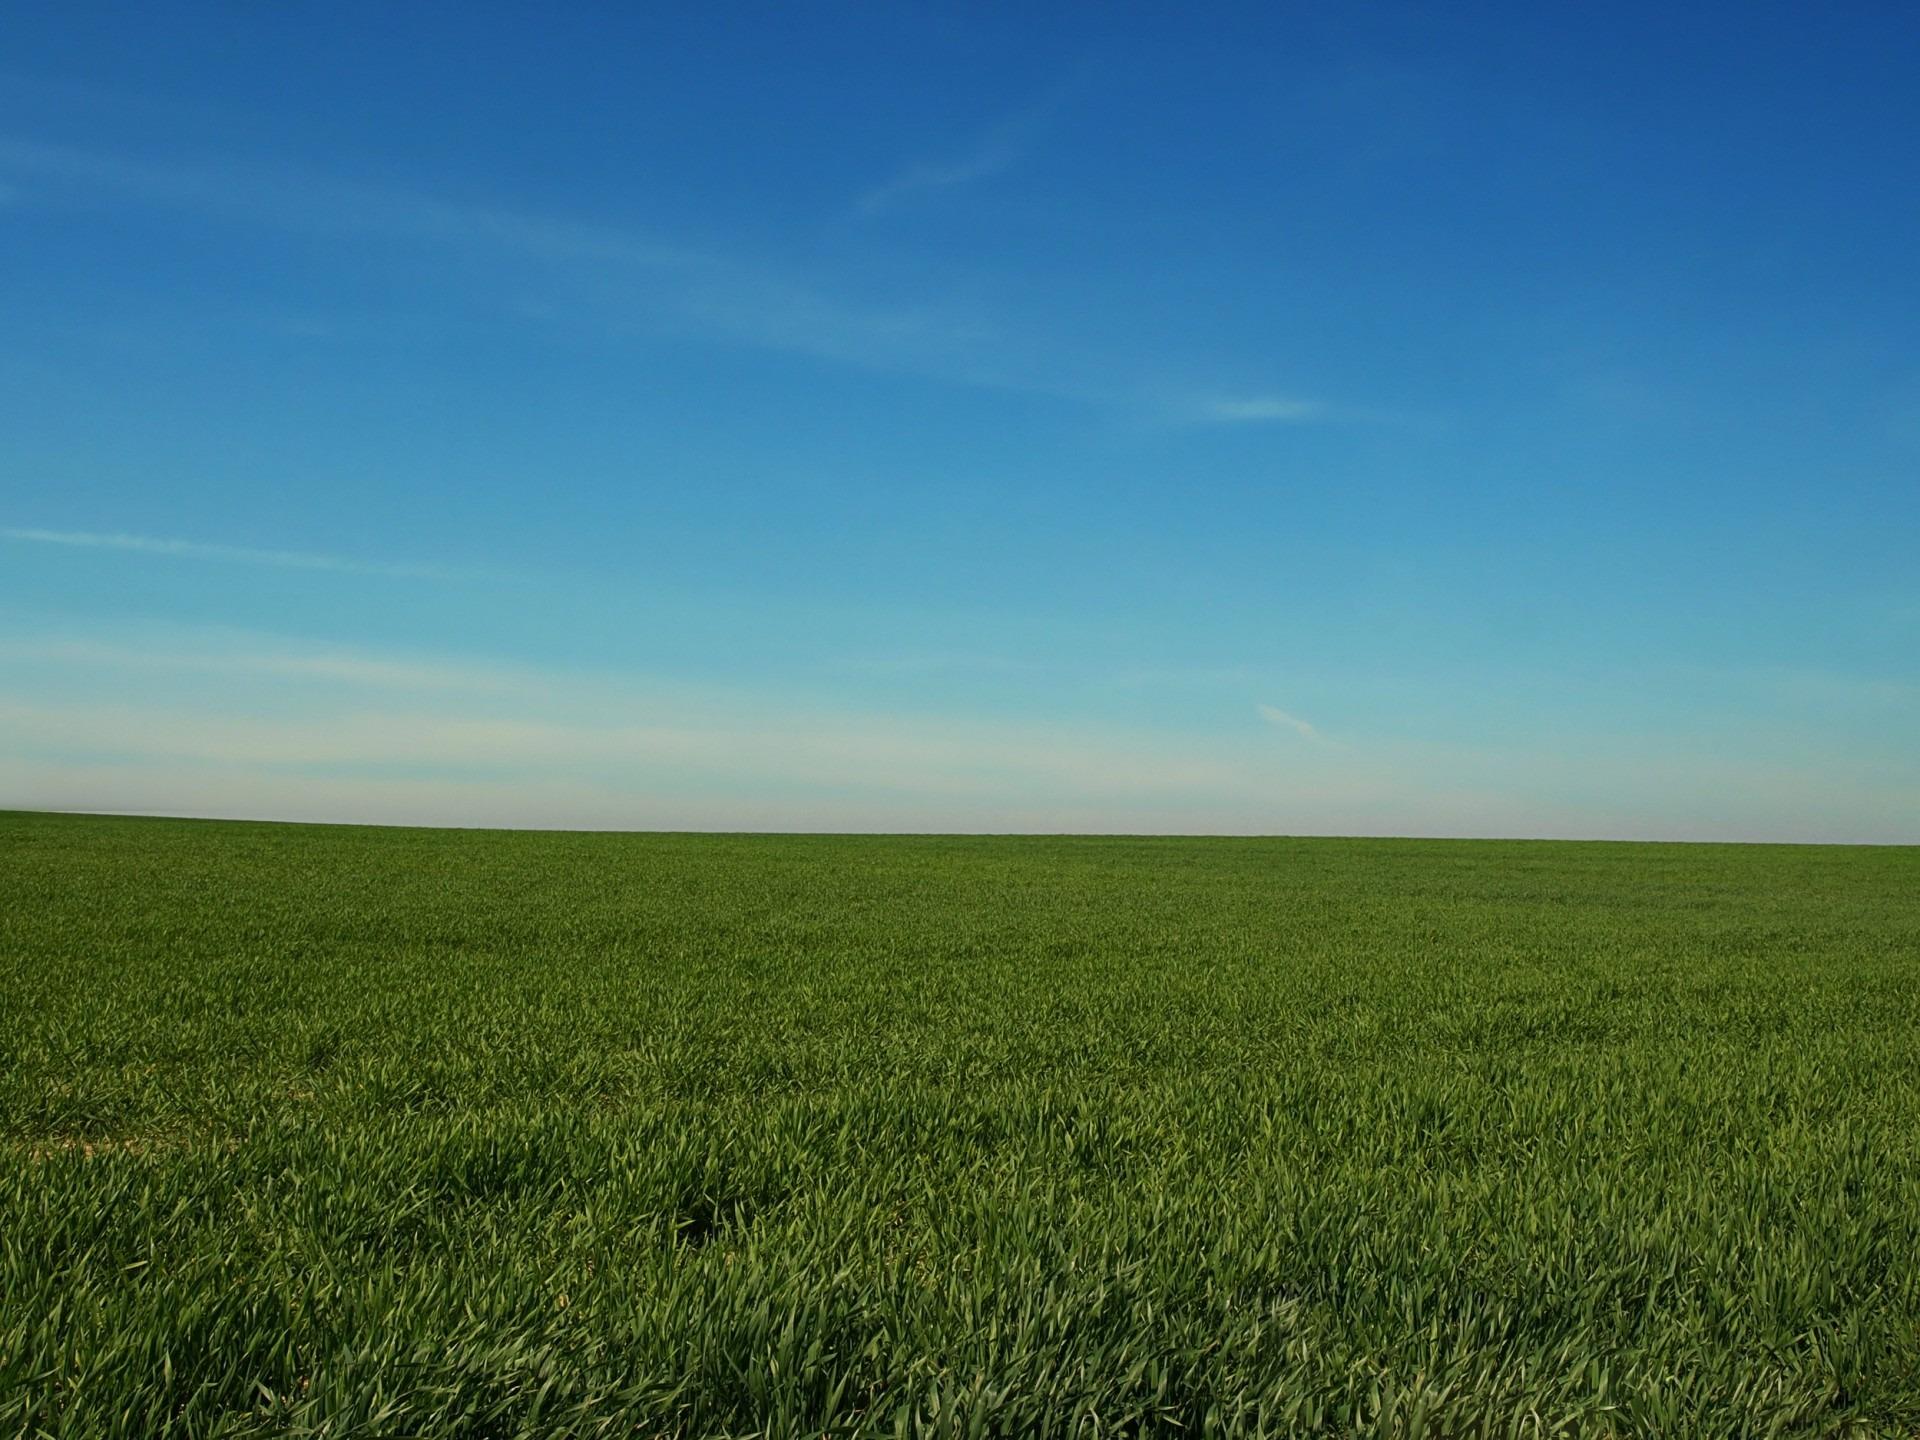 Free Images : landscape, horizon, marsh, cloud, sky, field, lawn ...